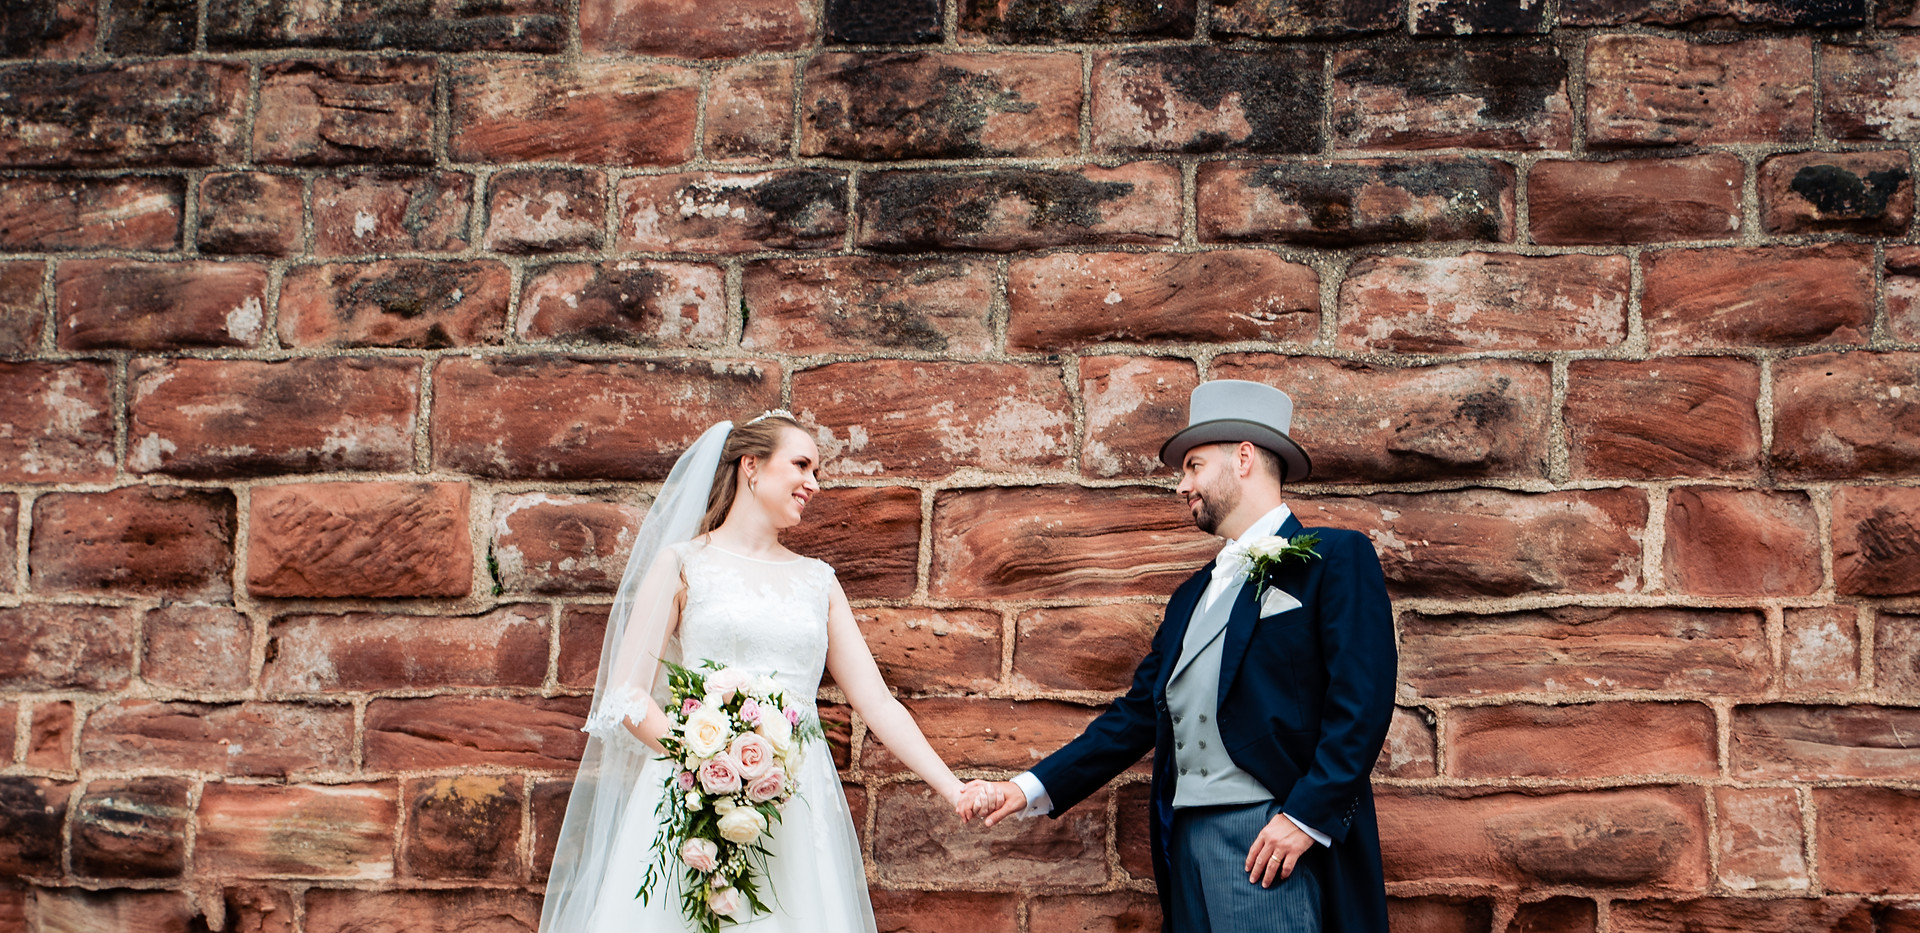 Oddfellows Wedding Photography___27.jpg